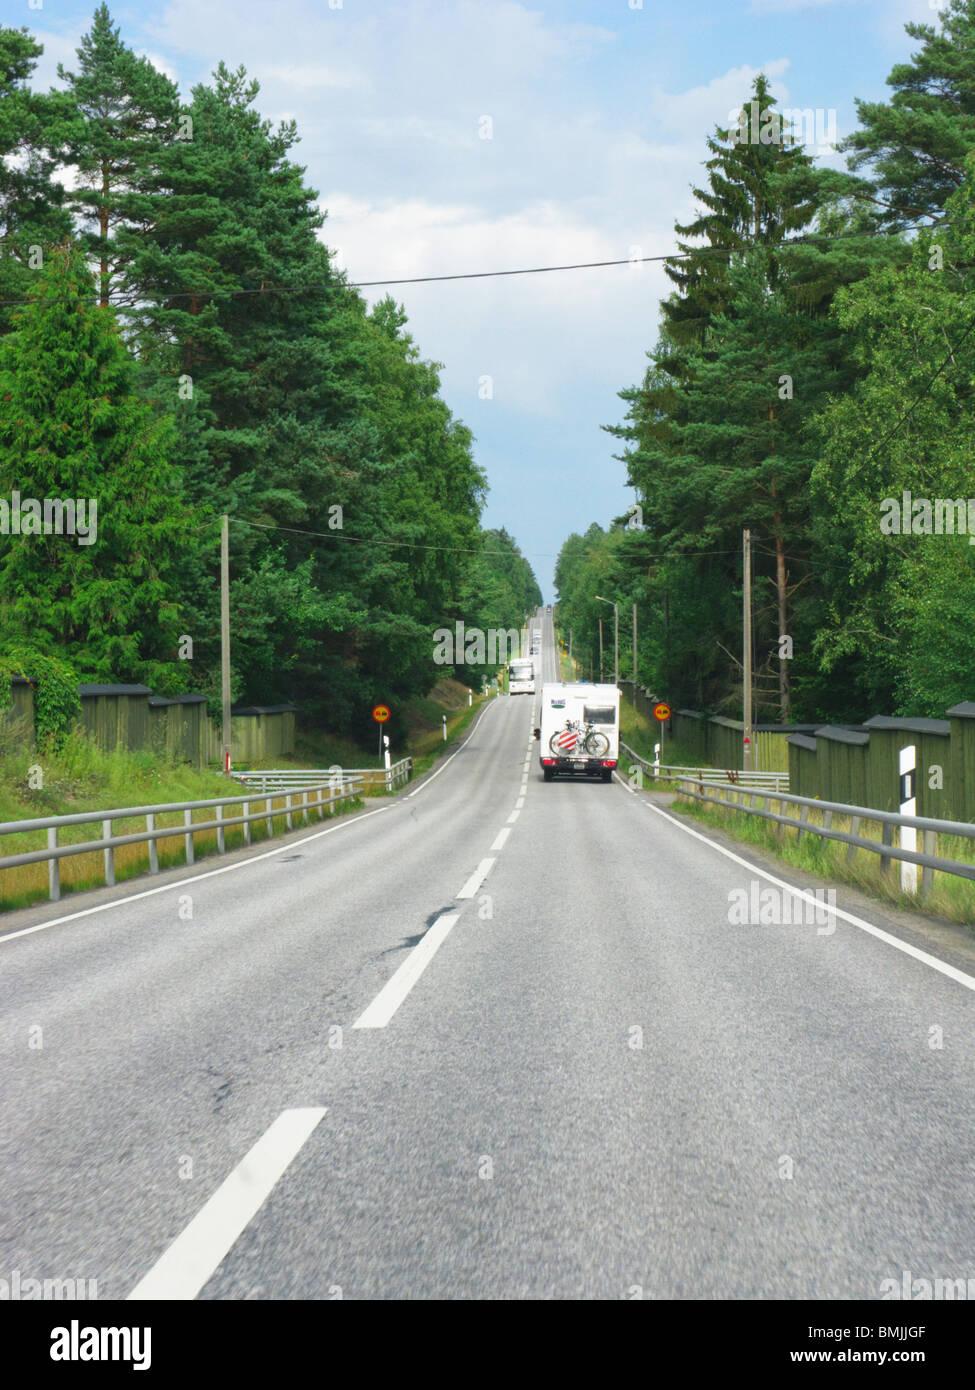 Scandinavia, Sweden, Sodermanland, Trailer on road - Stock Image